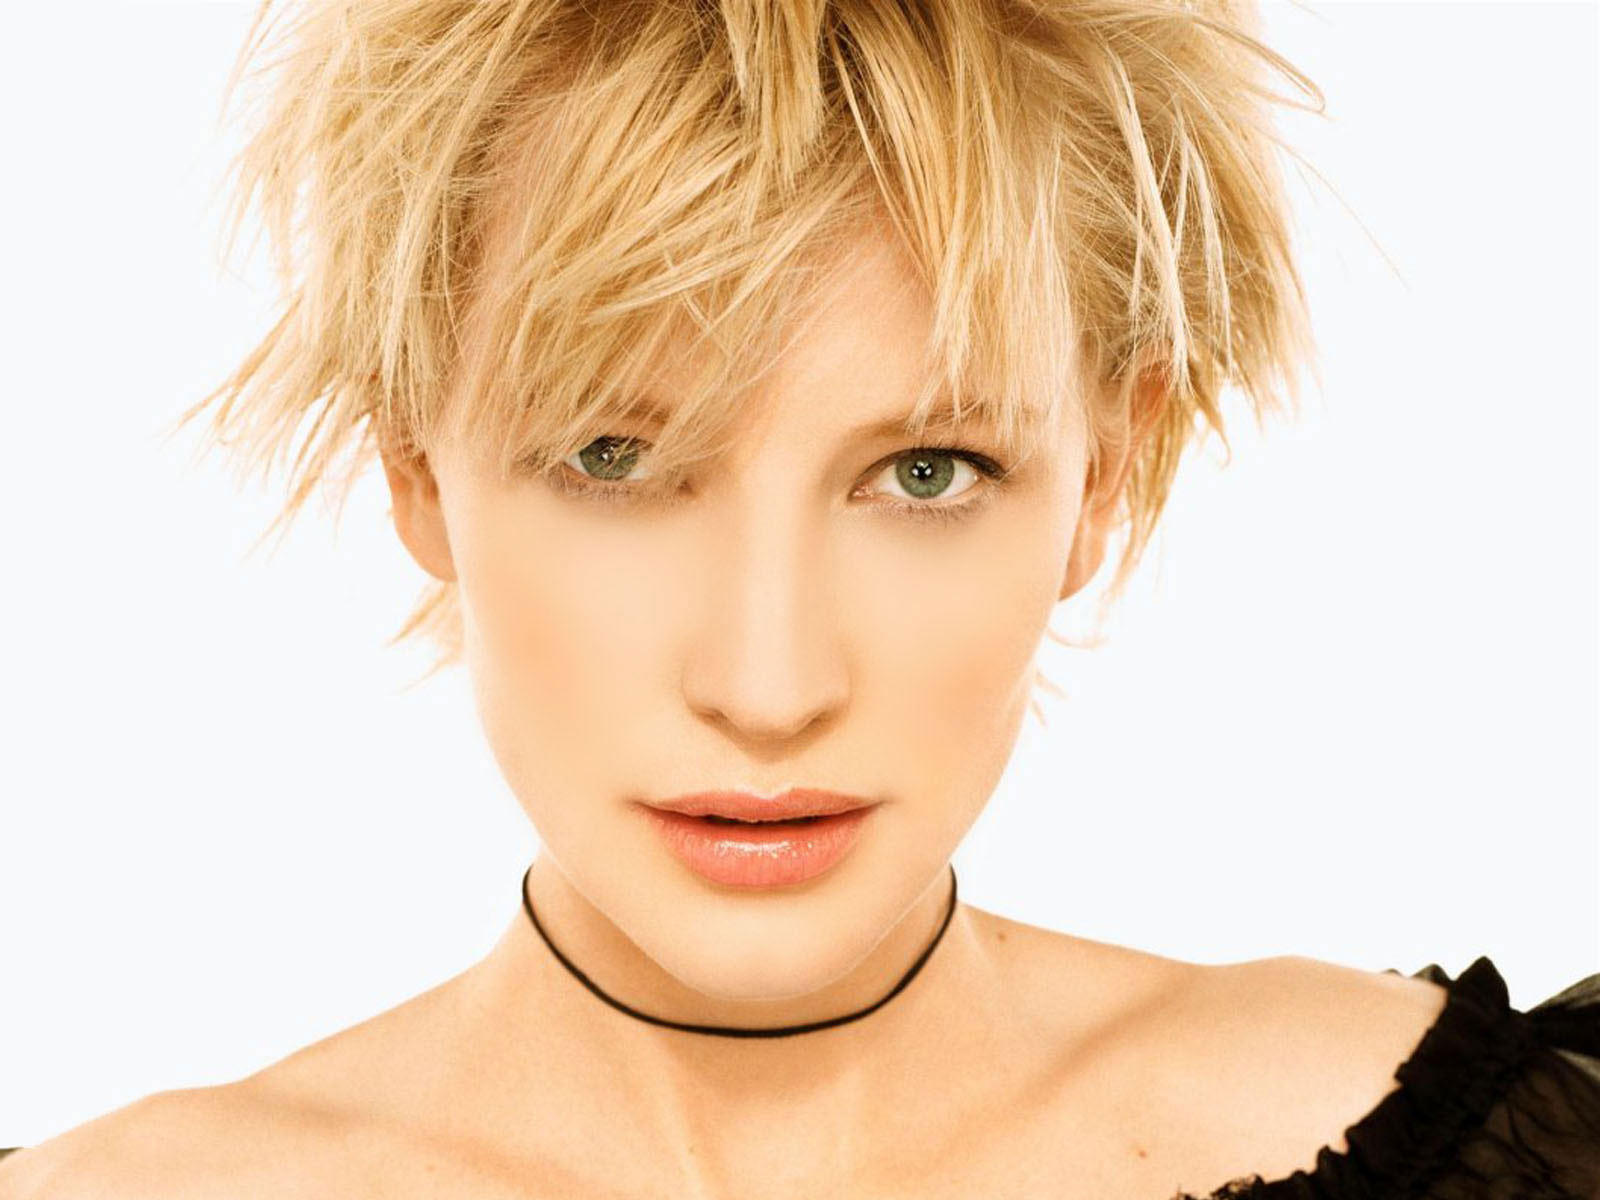 Australian Cate Blanchett